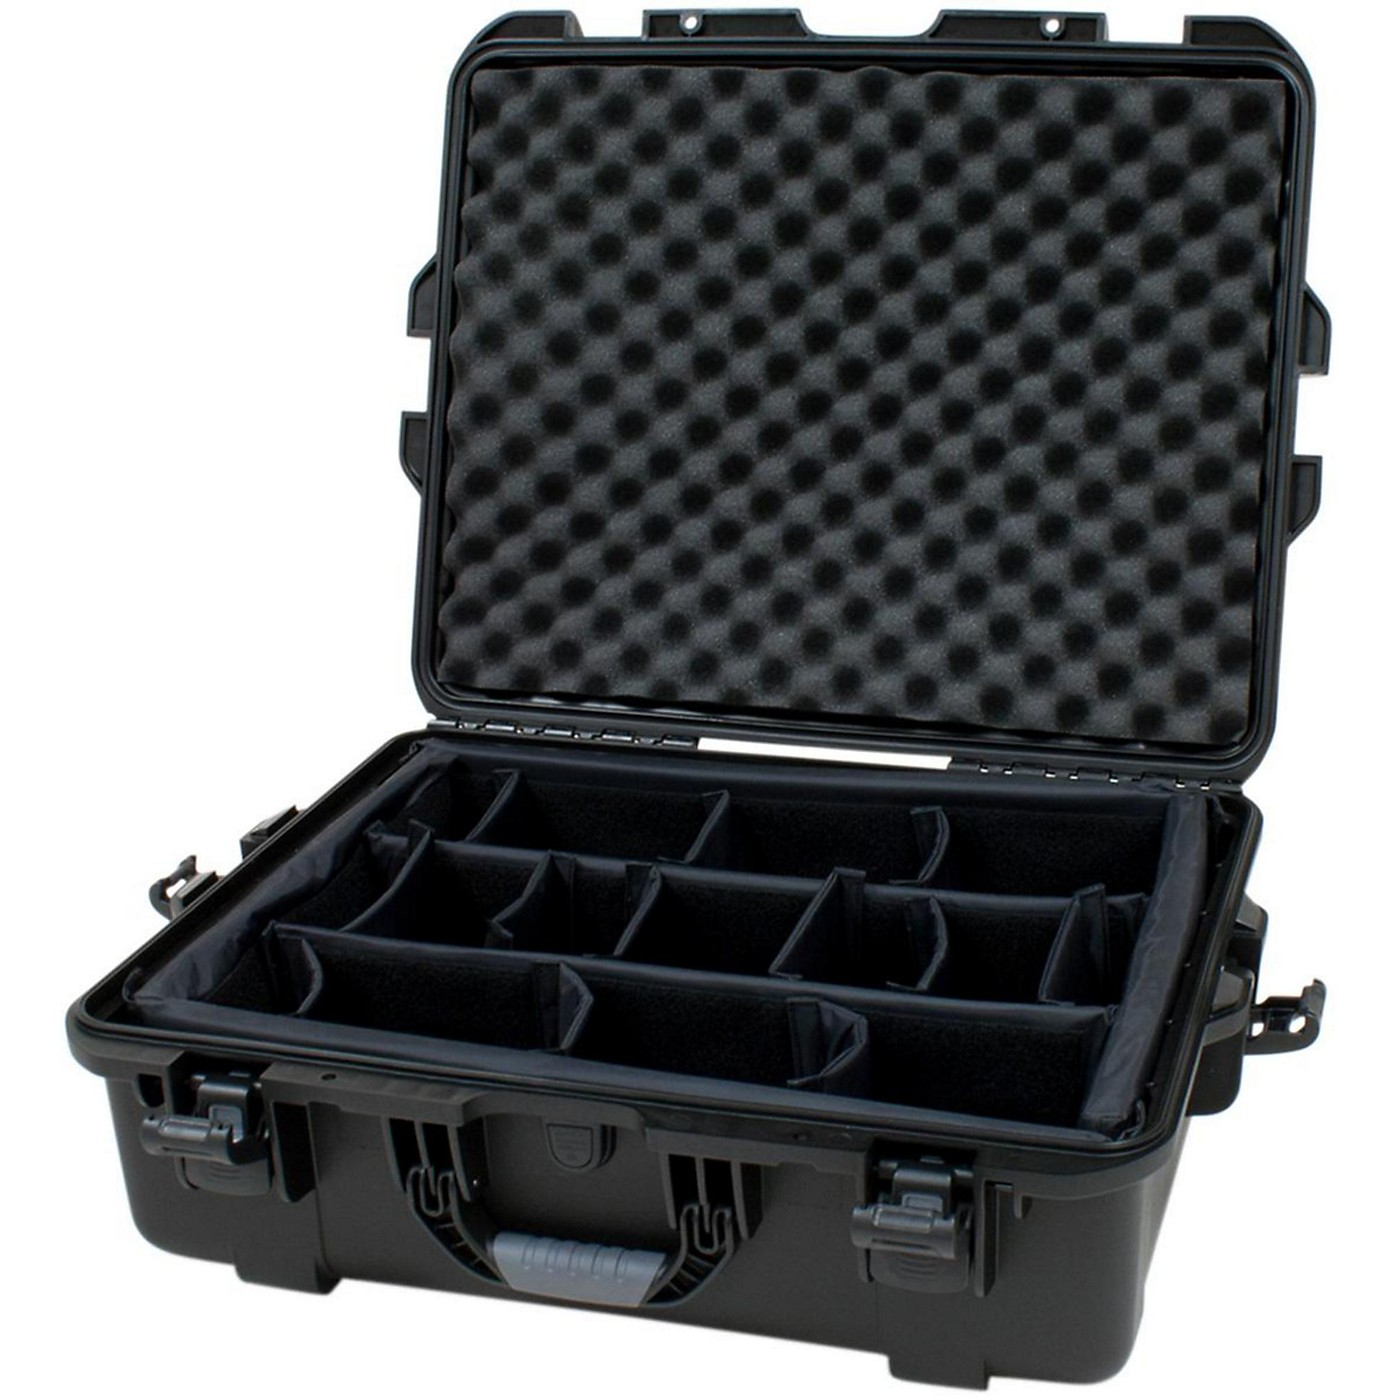 Gator GU-2014-08-WPDV Waterproof Injection Molded Case thumbnail